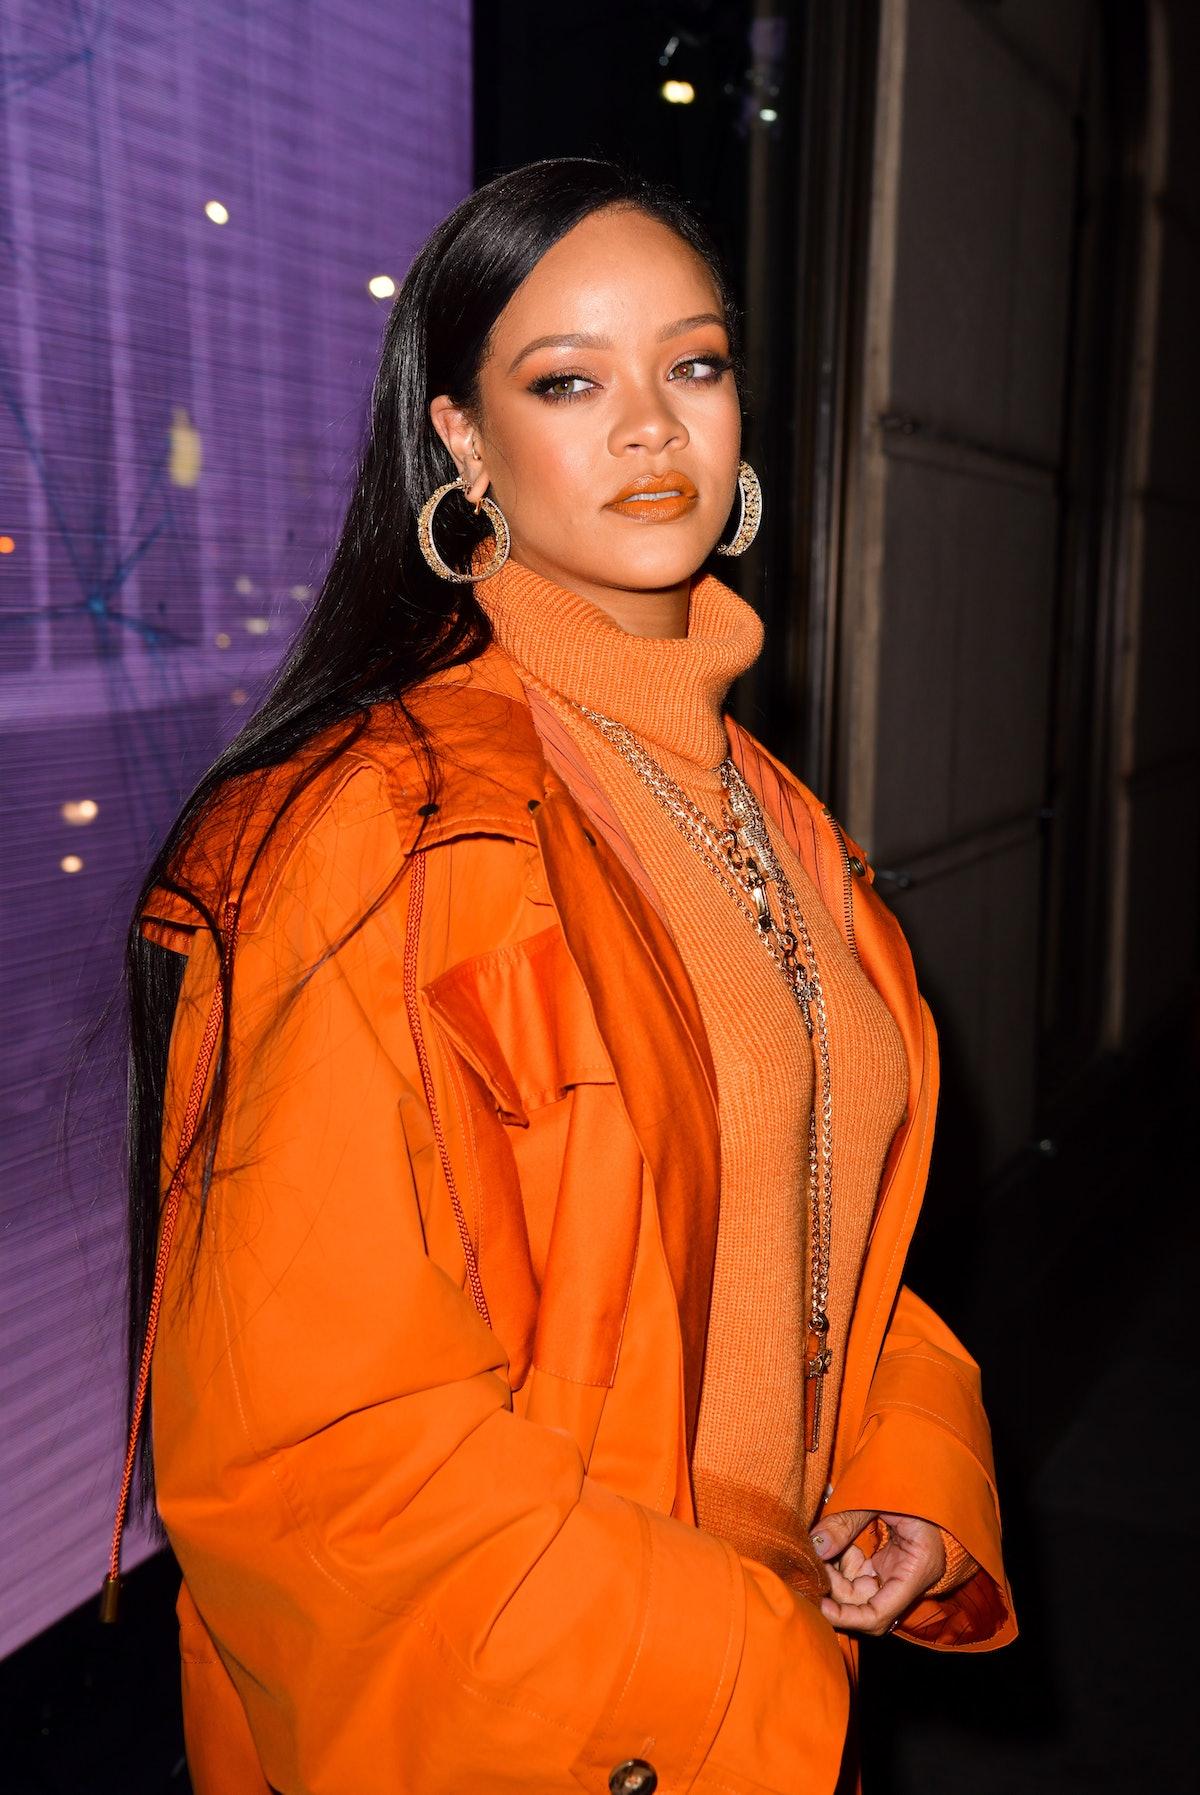 Rihanna's zodiac sign is Pisces